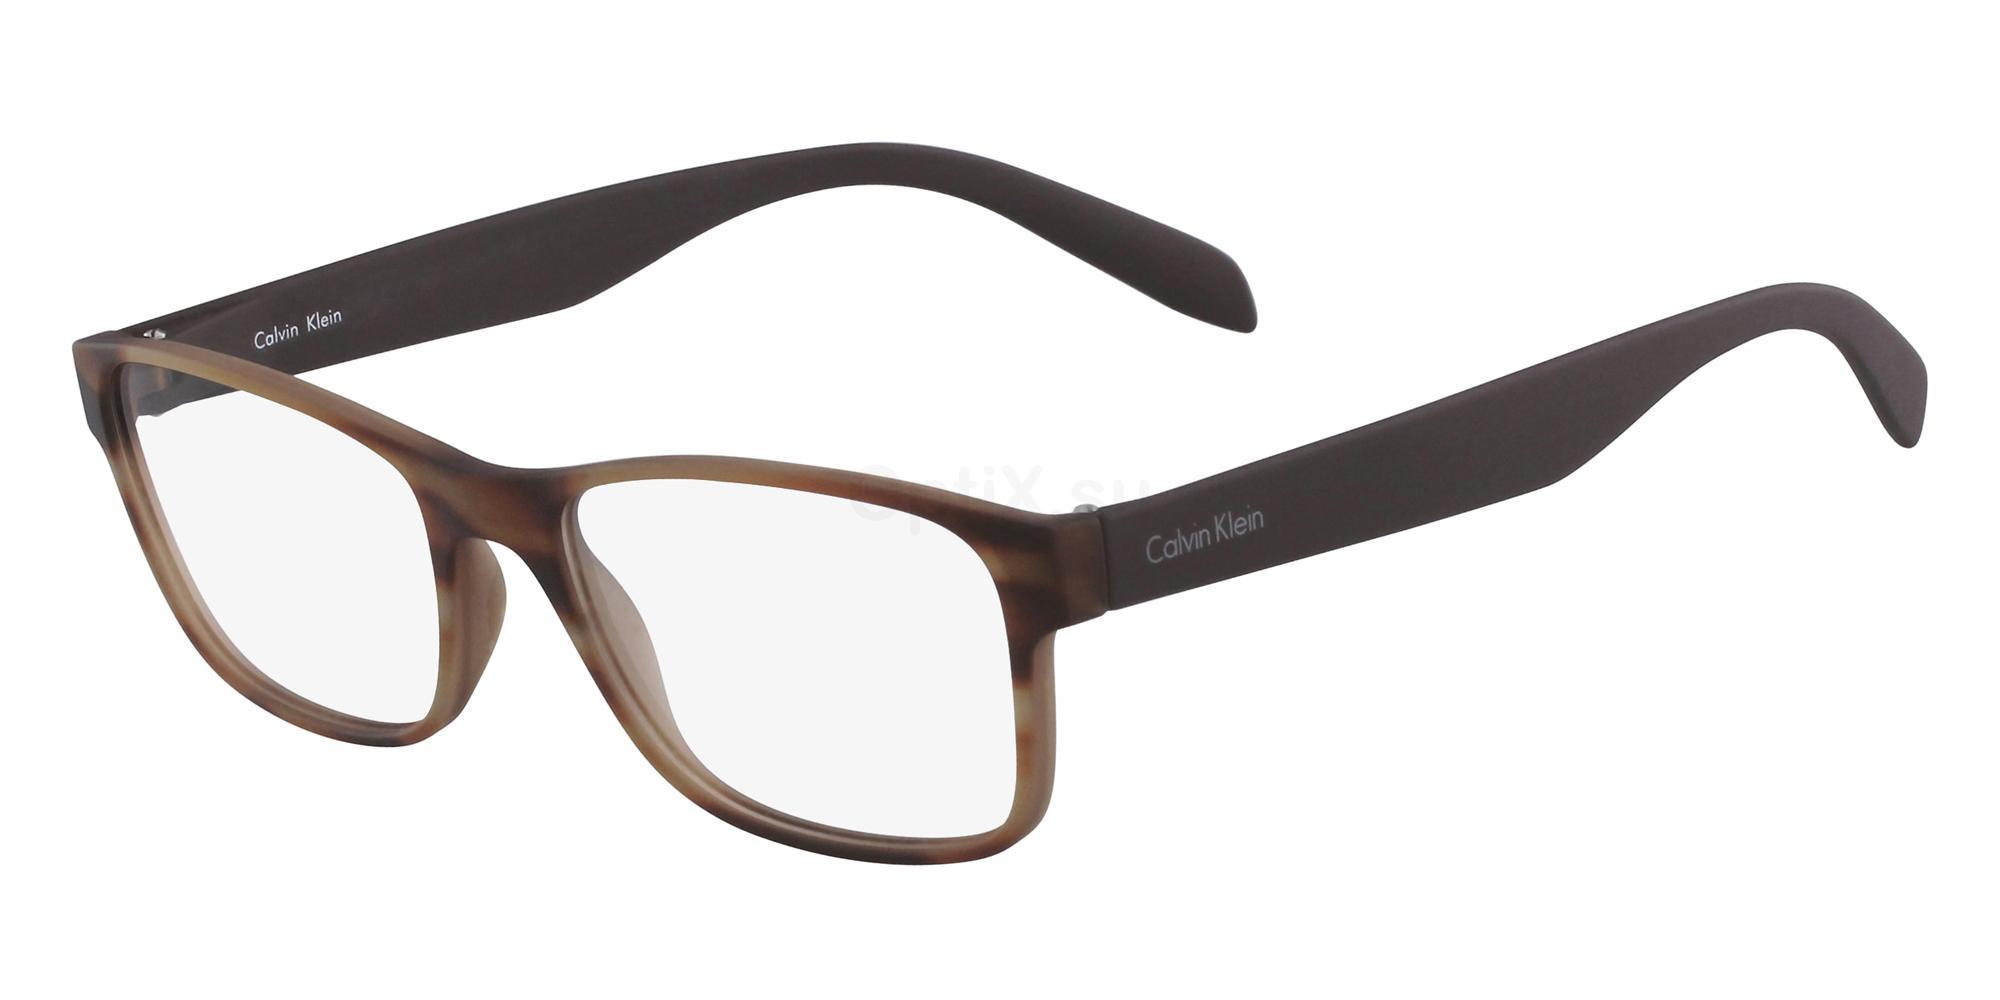 201 CK5970 Glasses, Calvin Klein